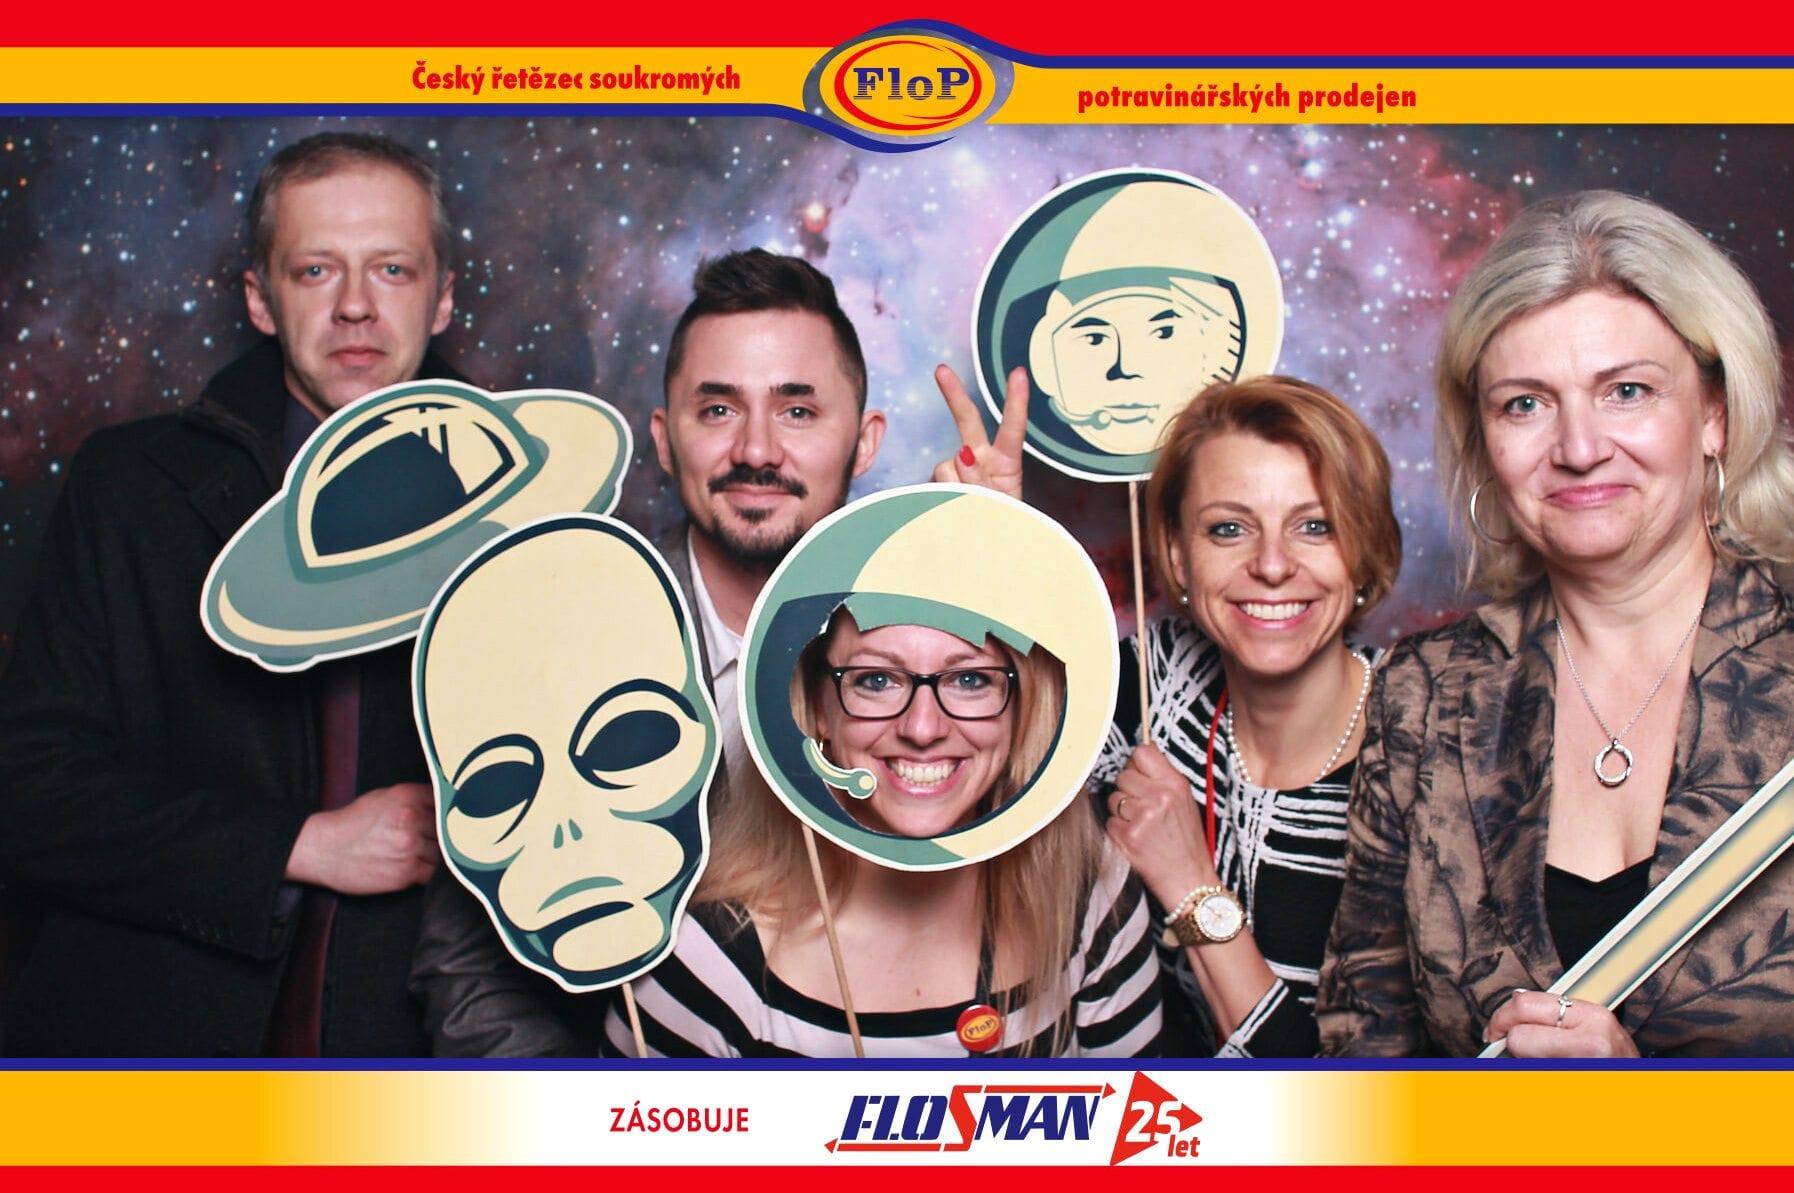 fotokoutek-flop-flosman-27-4-2017-238746